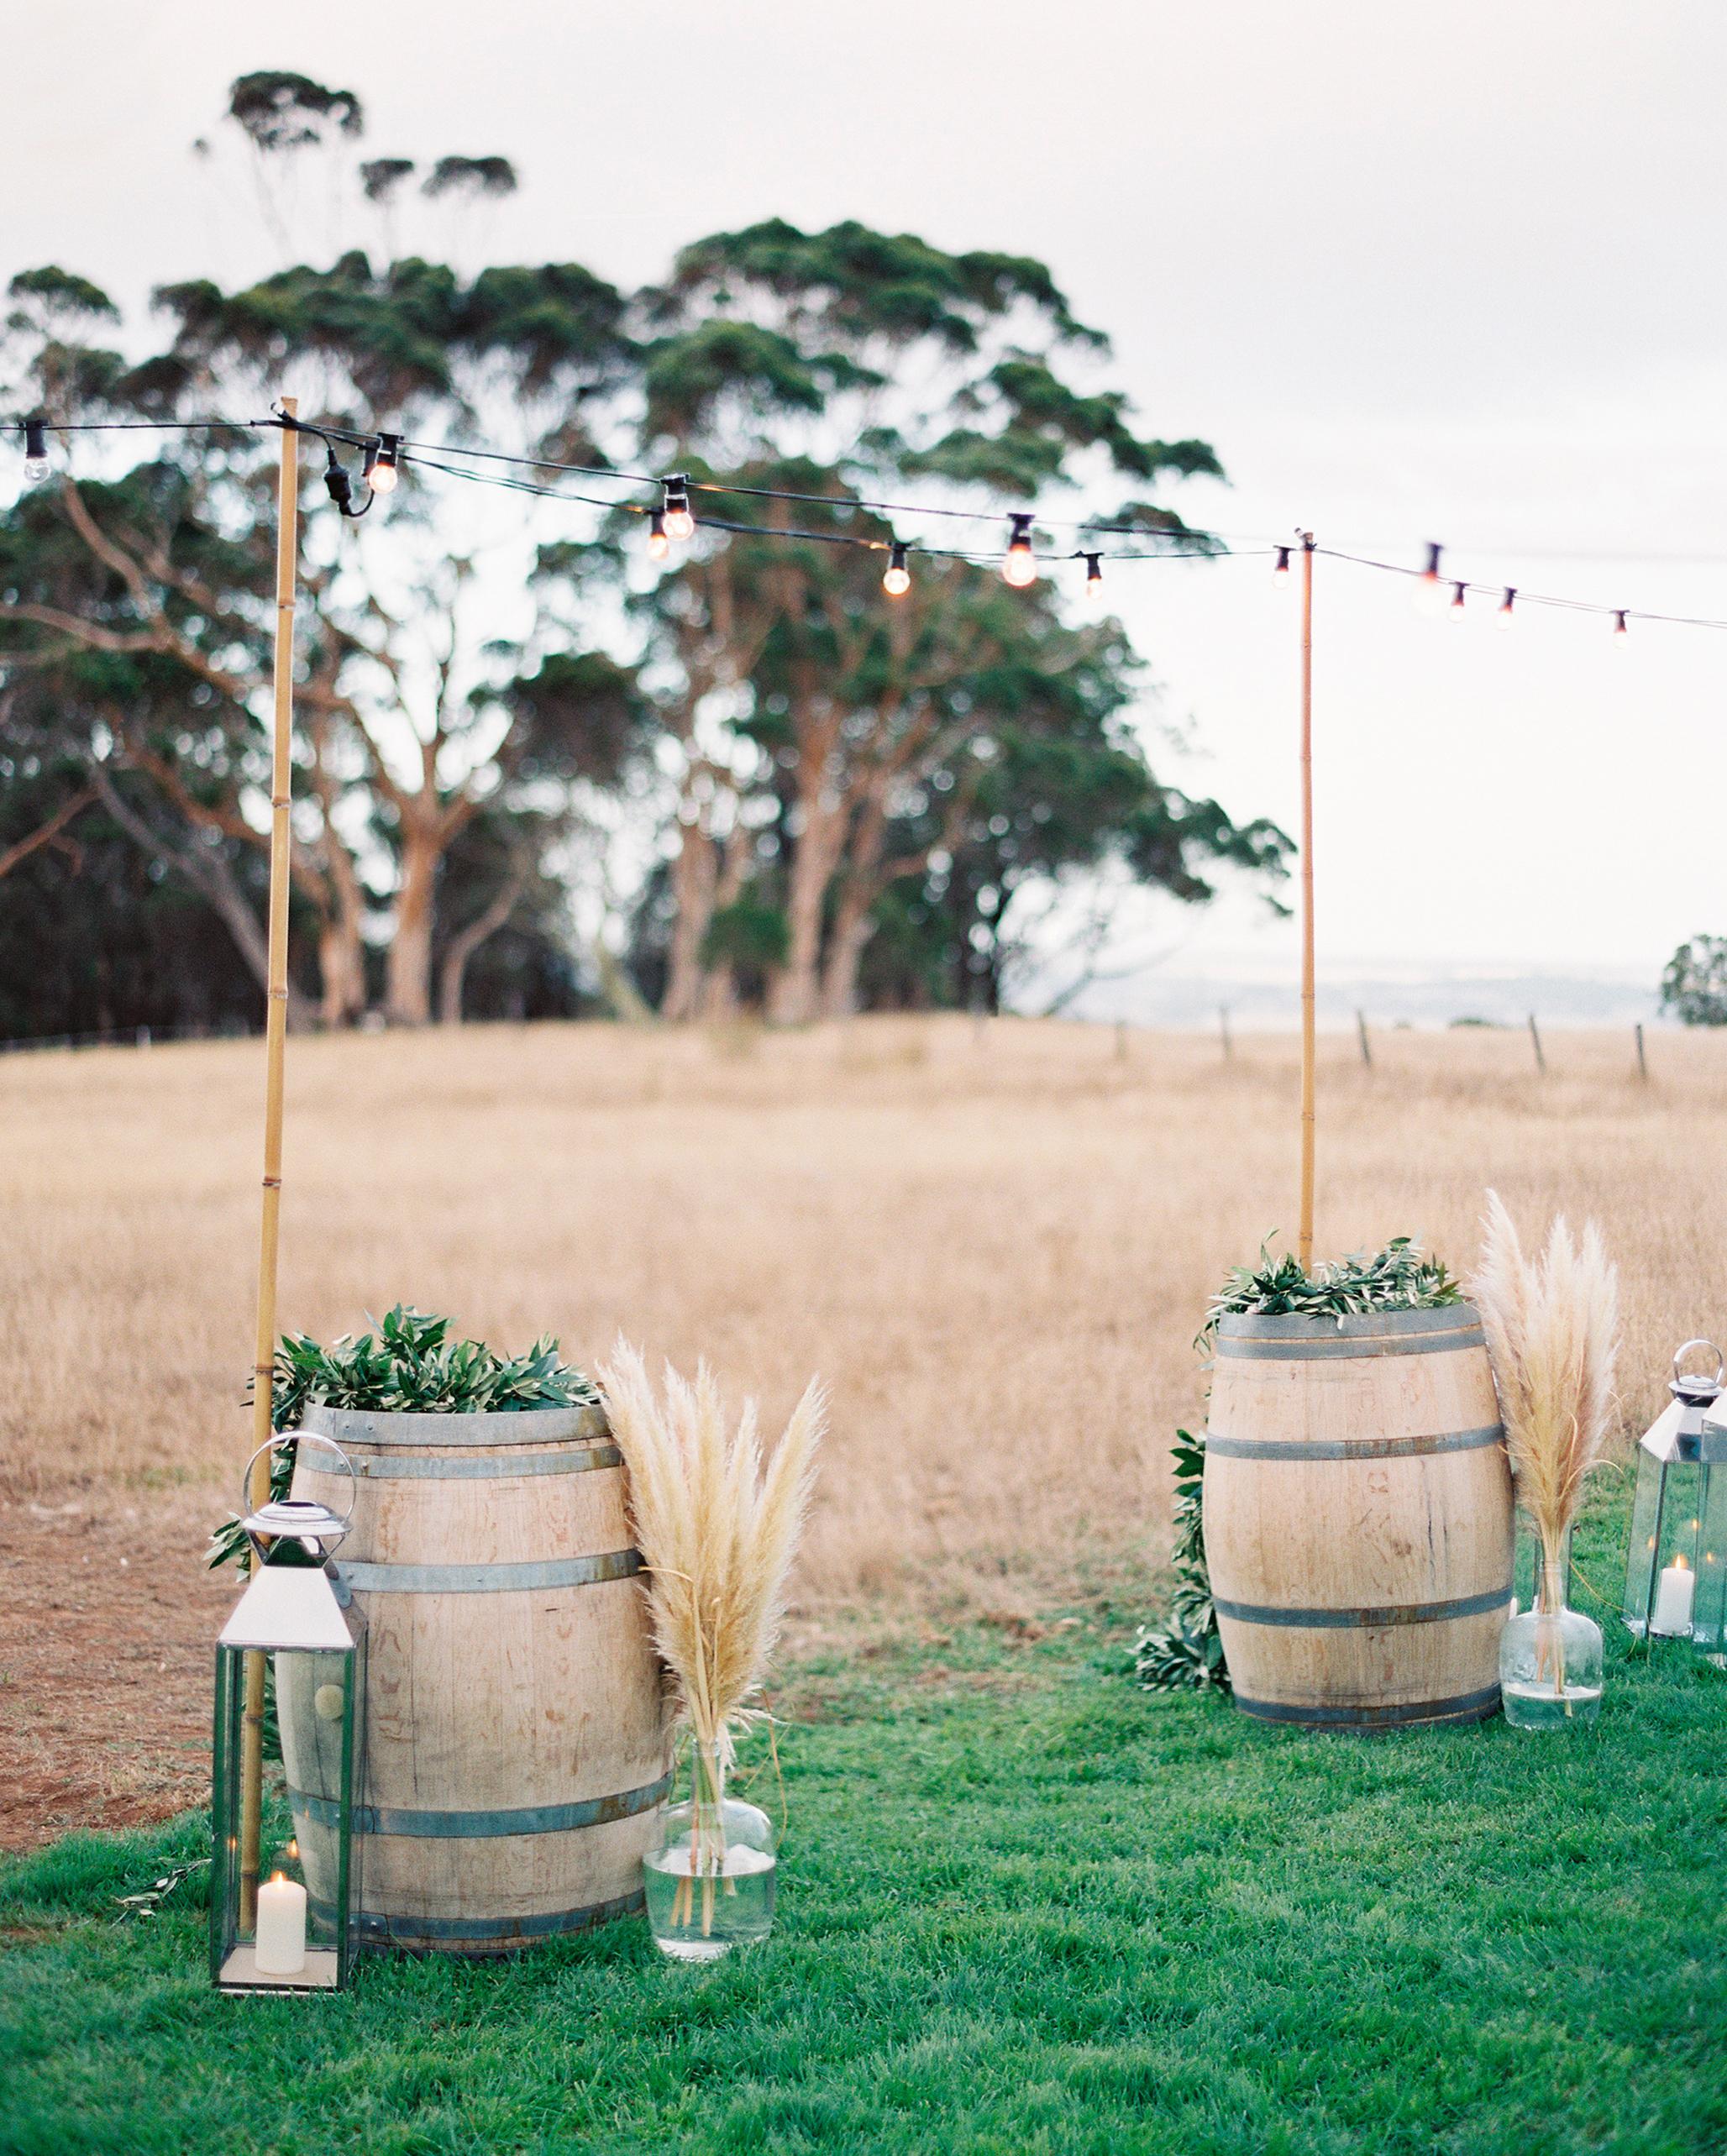 jemma-michael-wedding-barrels-002591007-s112110-0815.jpg